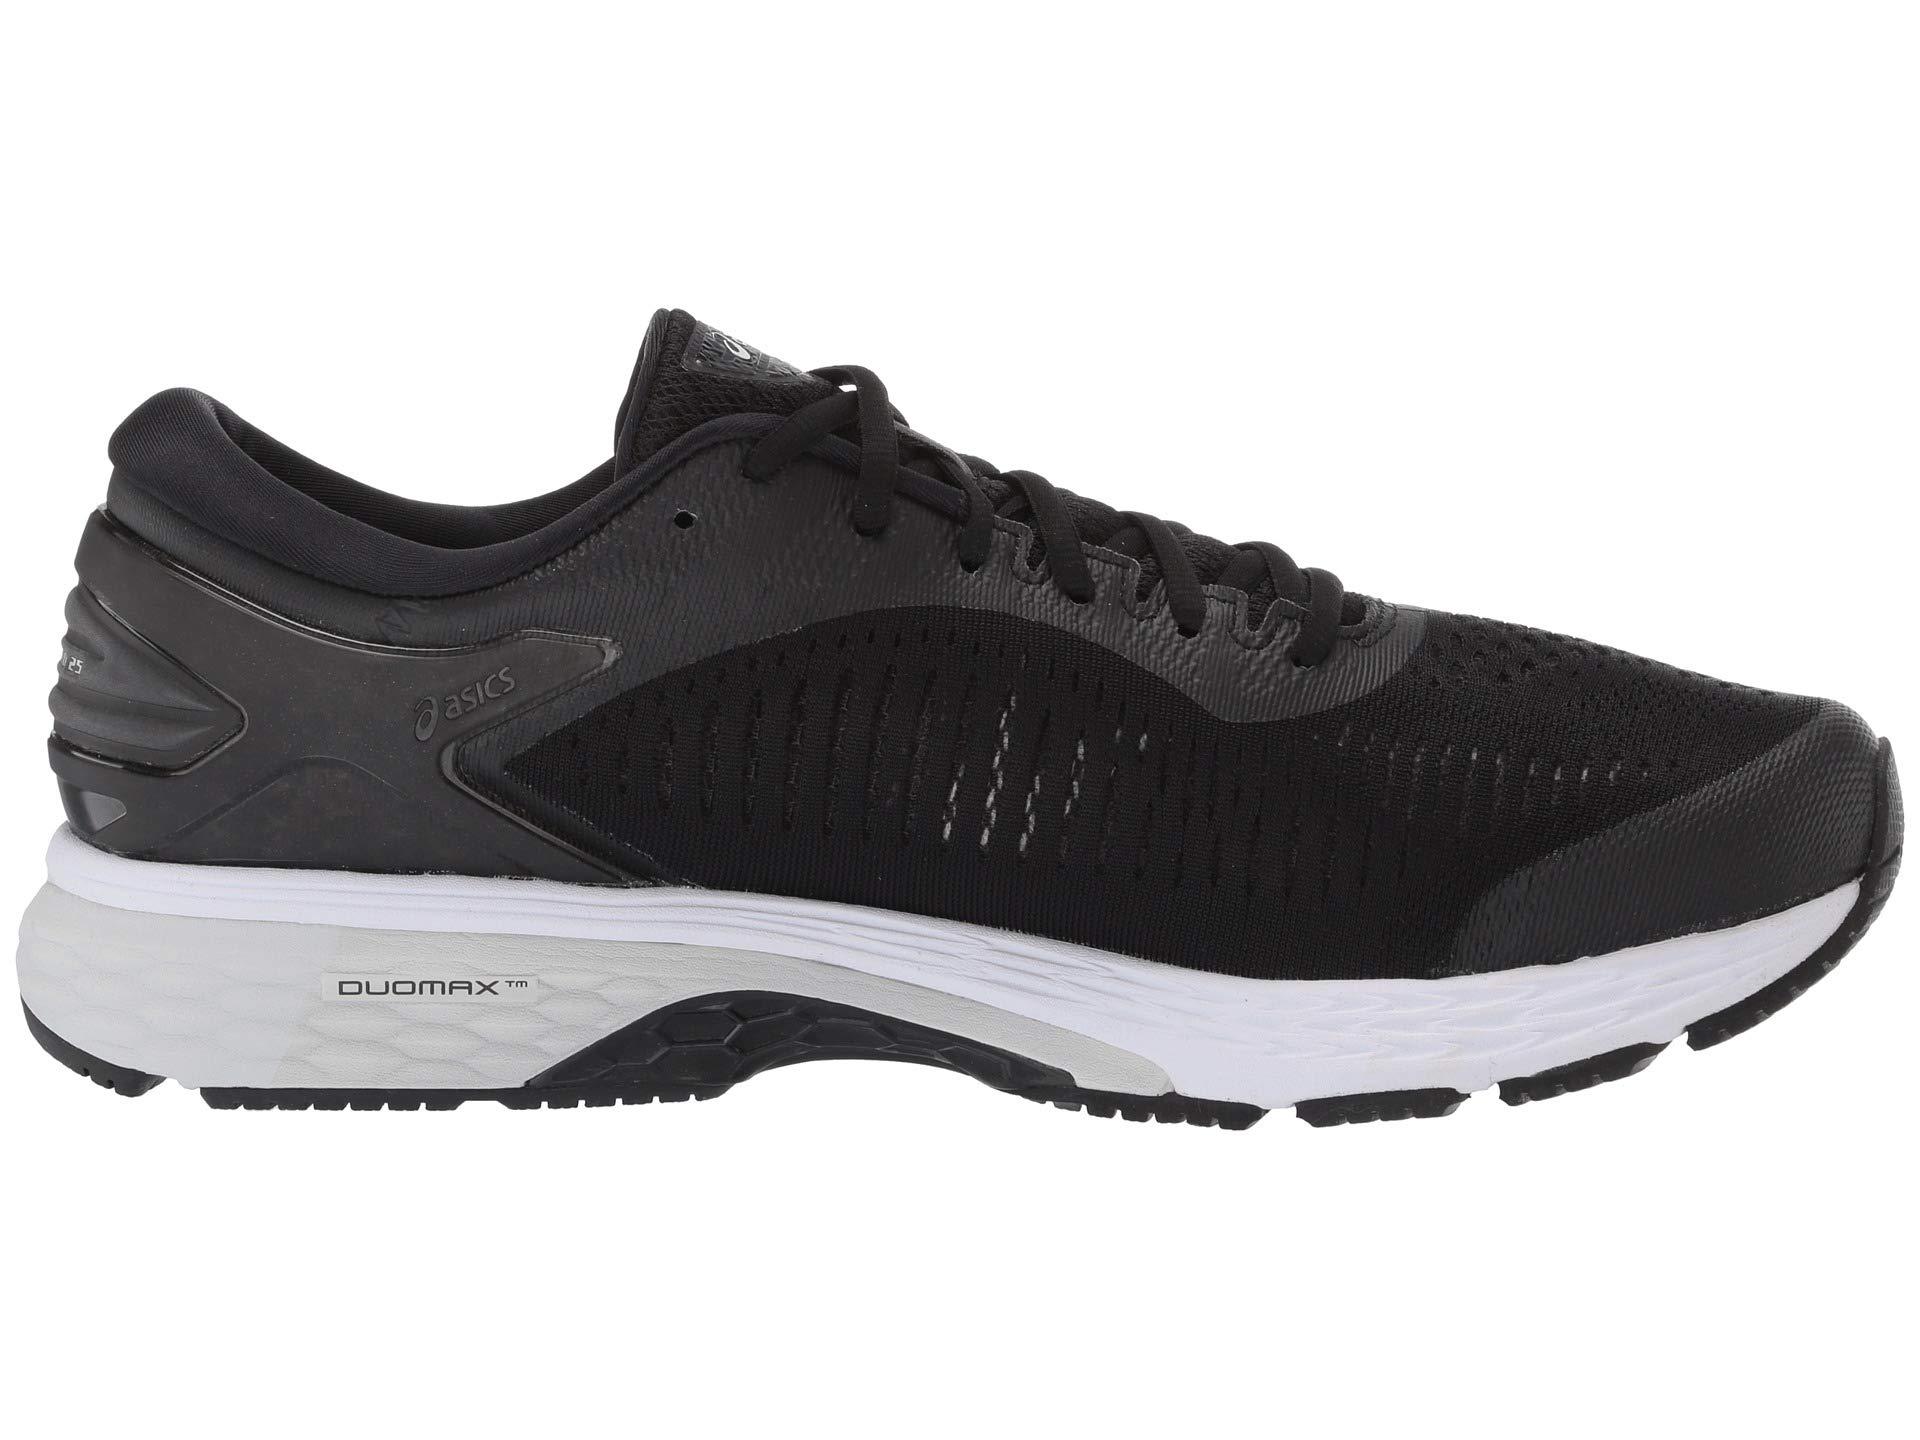 ASICS Gel Kayano 25 Men's Running Shoe, Black/Glacier Grey, 6.5 D US by ASICS (Image #8)